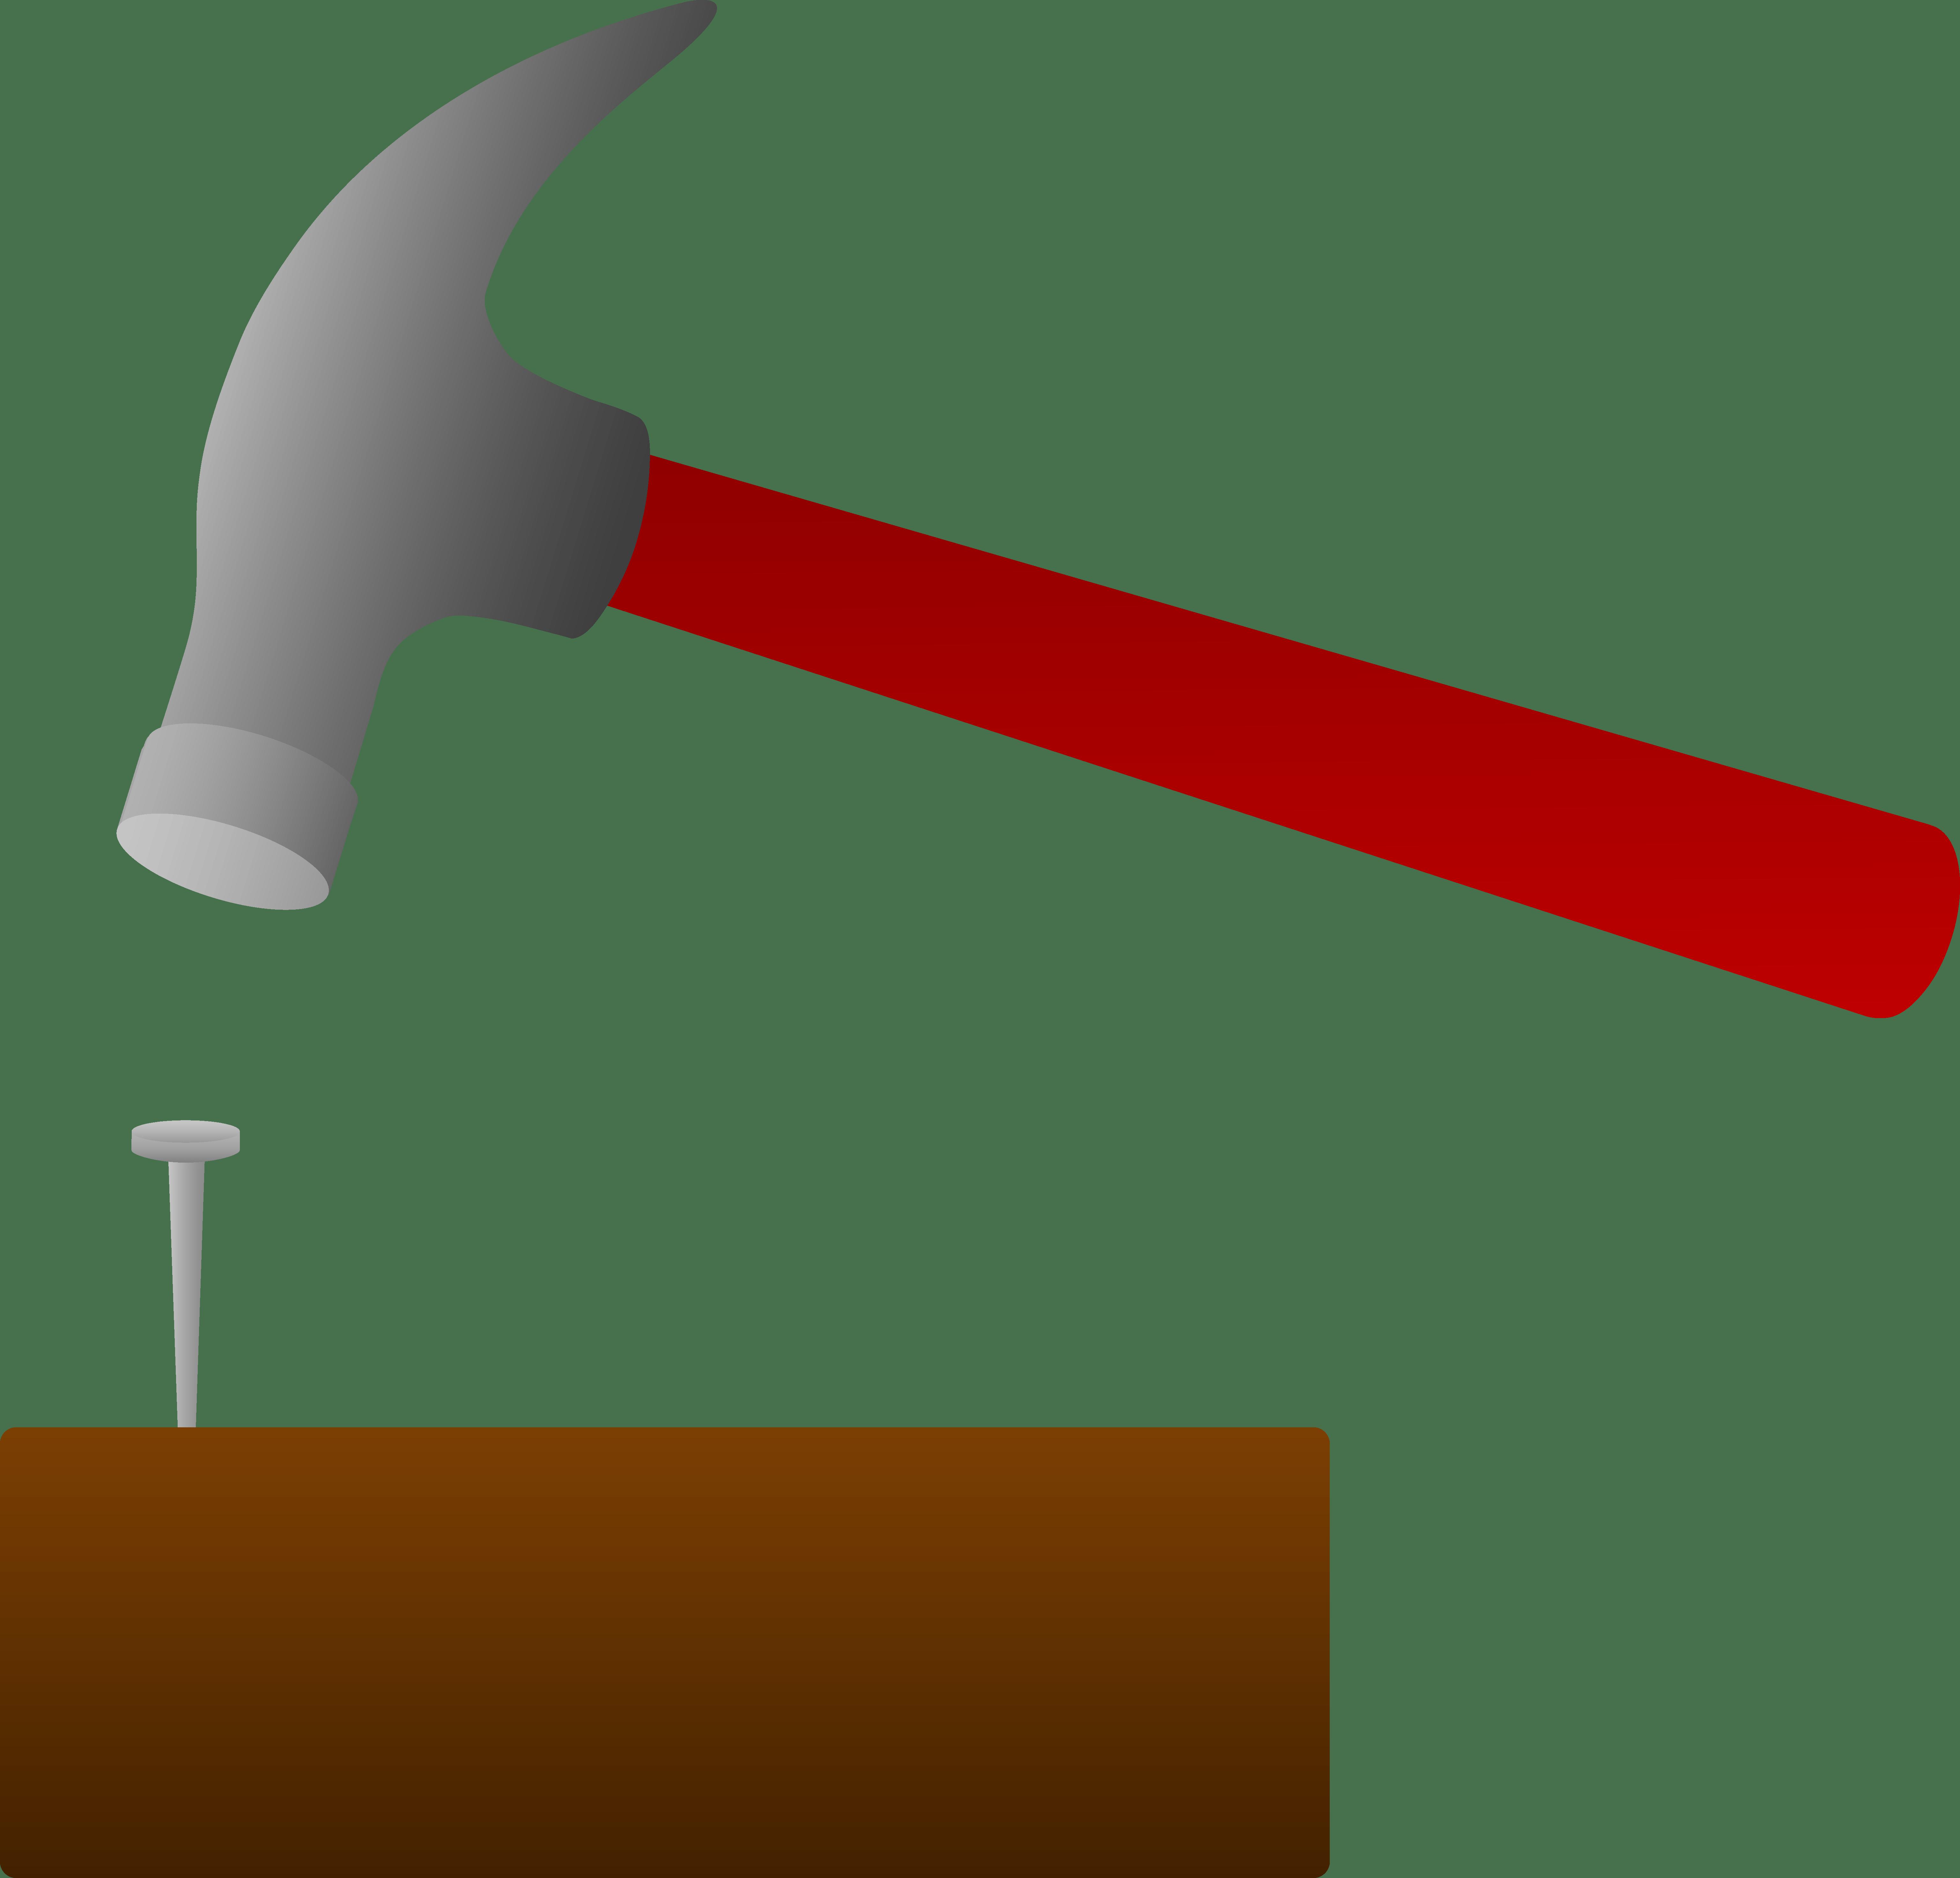 Nail clipart hammer outline, Nail hammer outline Transparent.